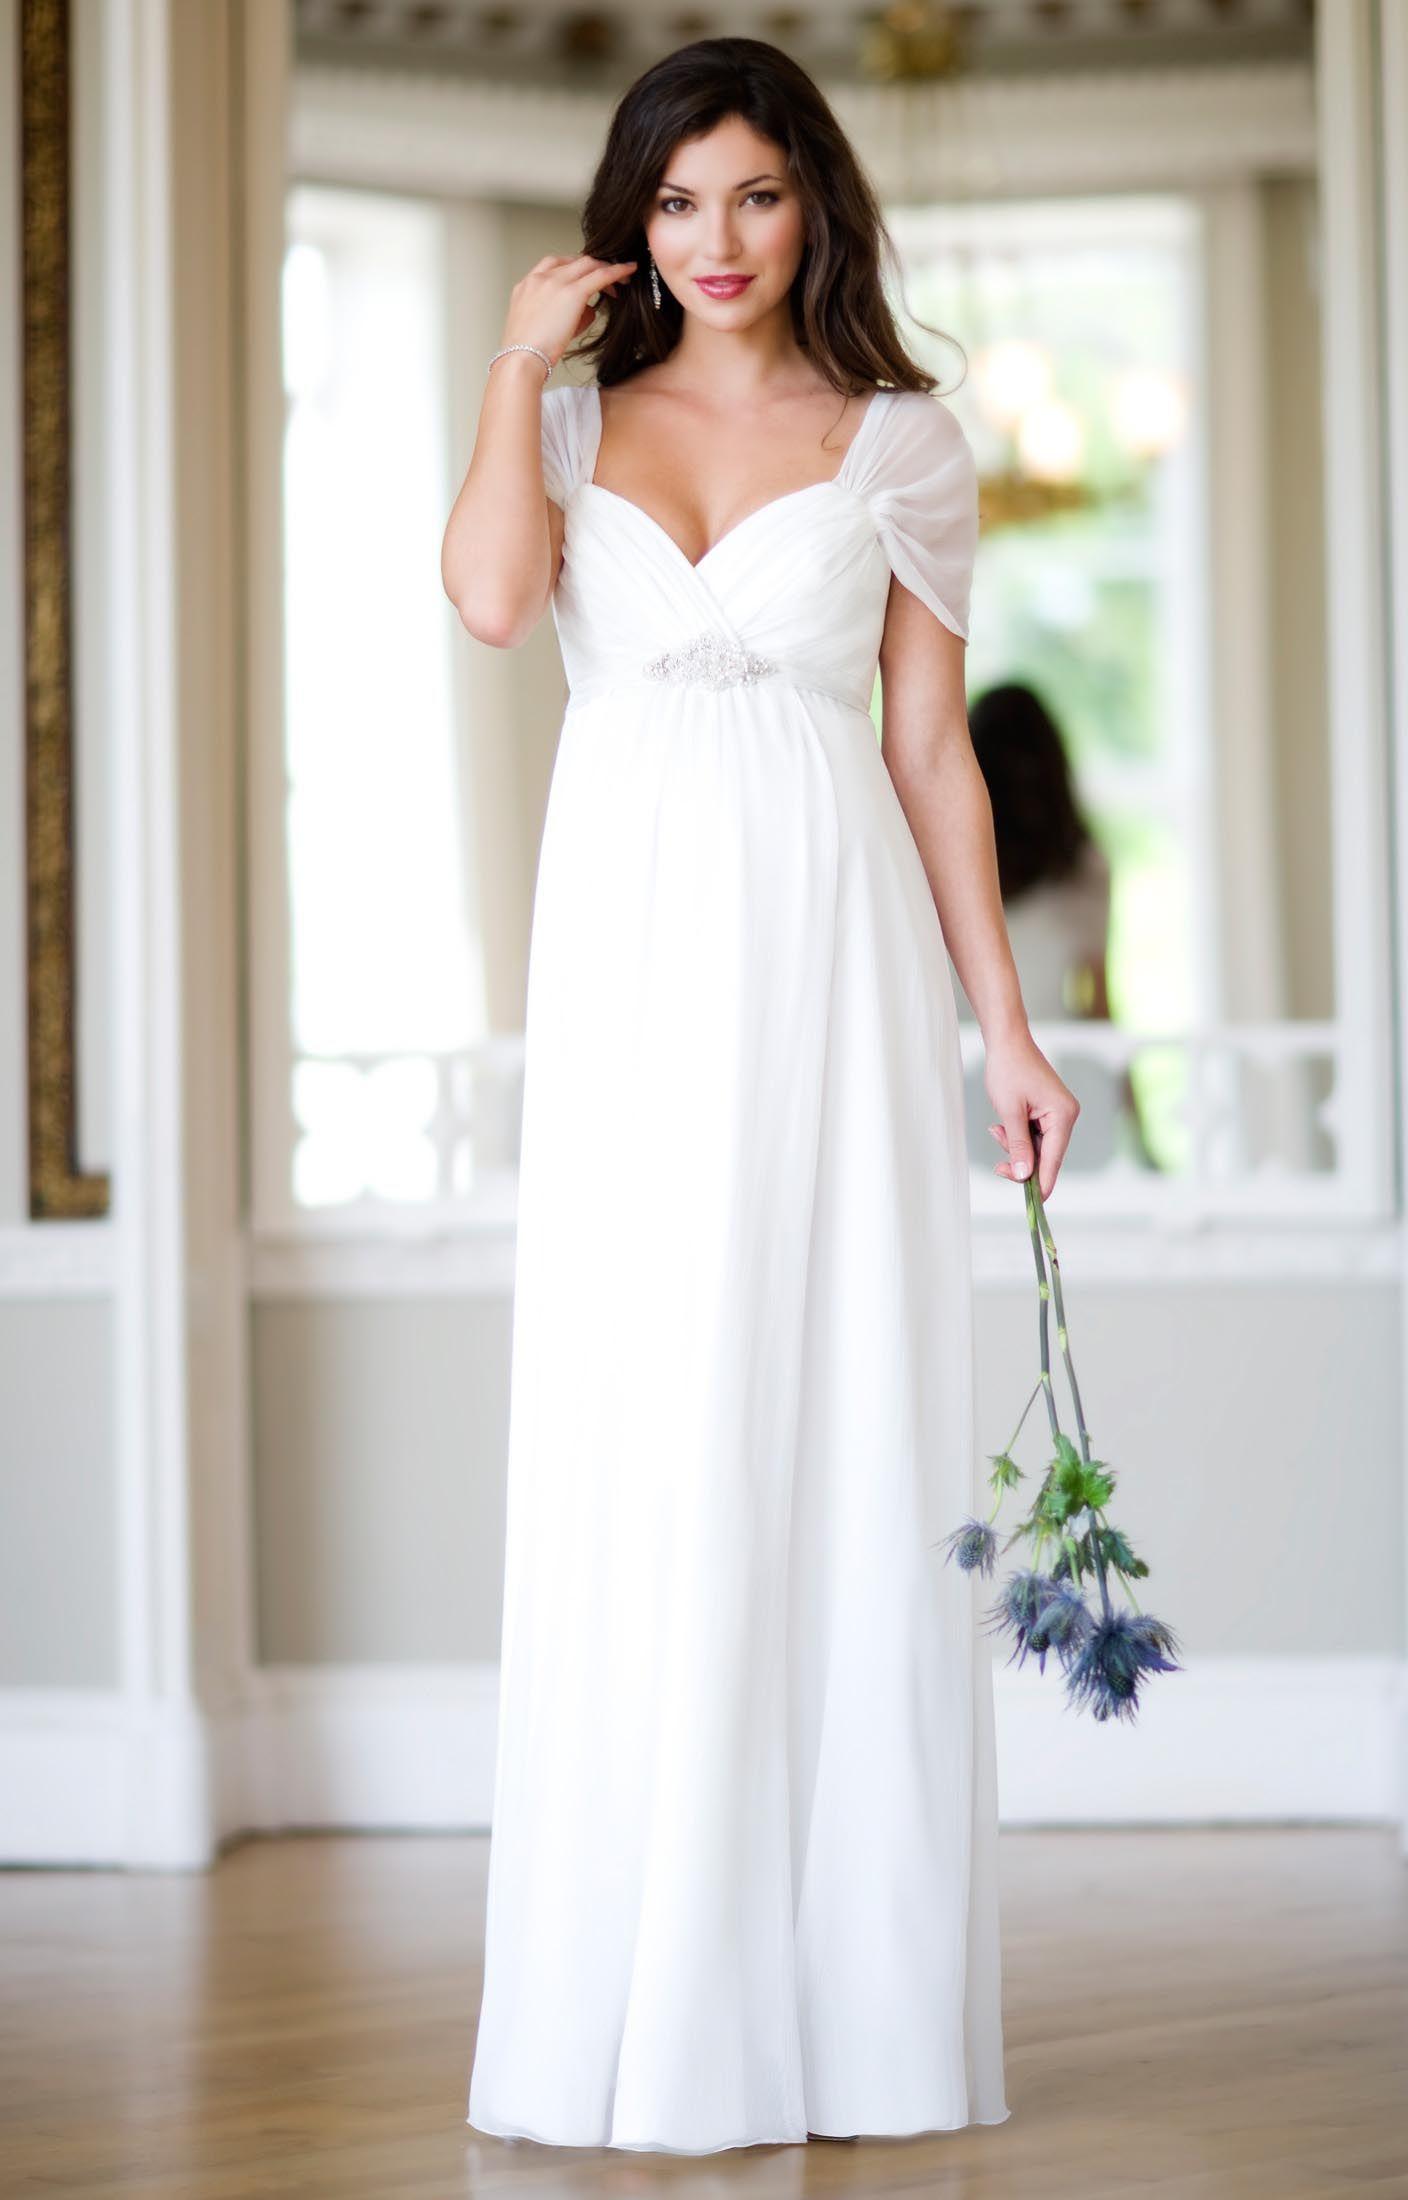 Maternity wedding dress with sleeves  Silk Sophia Maternity Wedding Gown Ivory by Tiffany Rose  Wedding